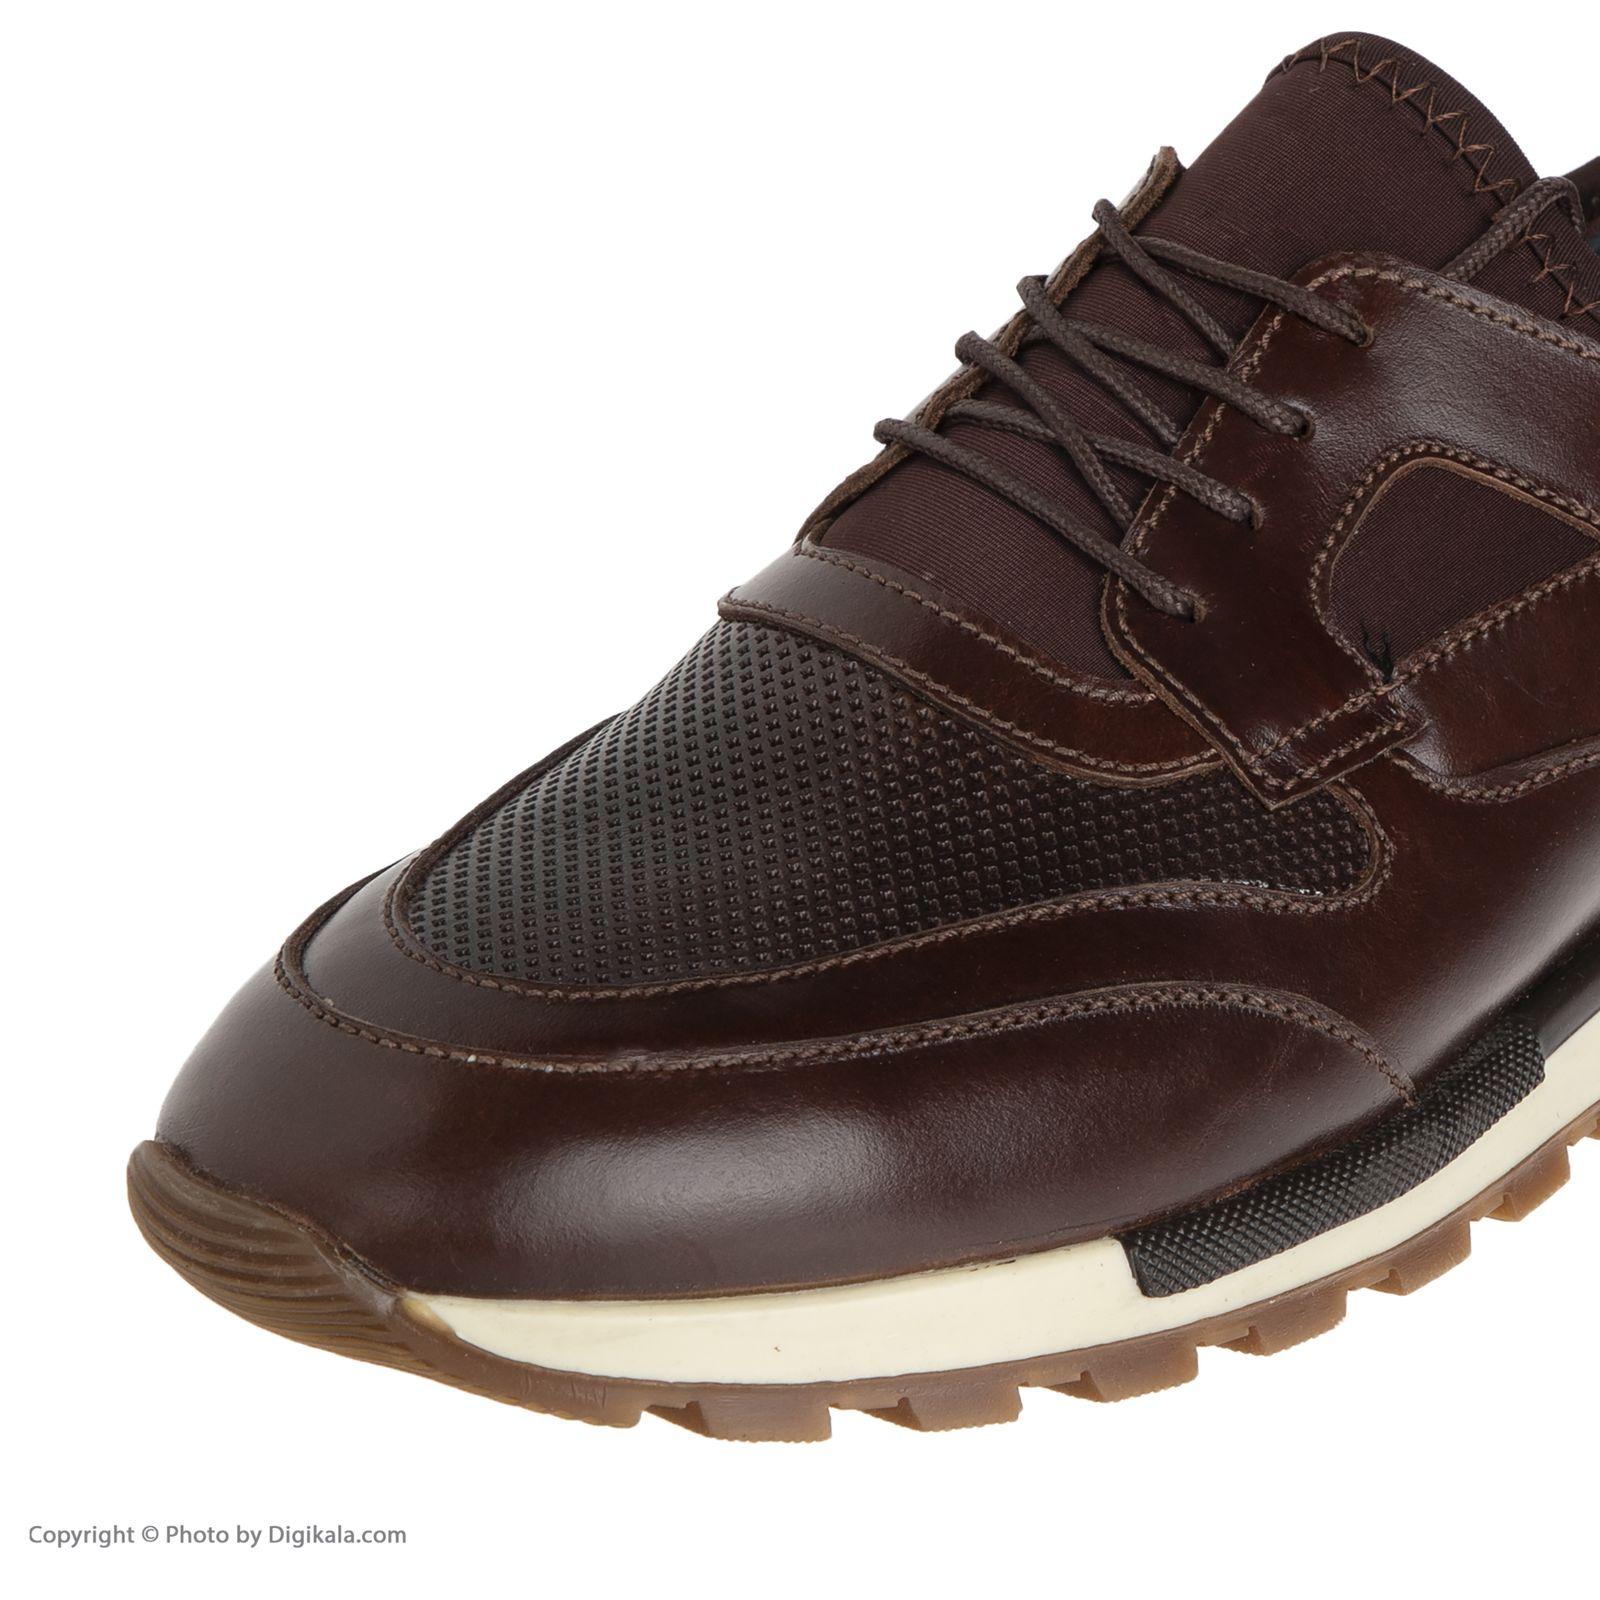 کفش روزمره مردانه دلفارد مدل 8374A503104 -  - 8